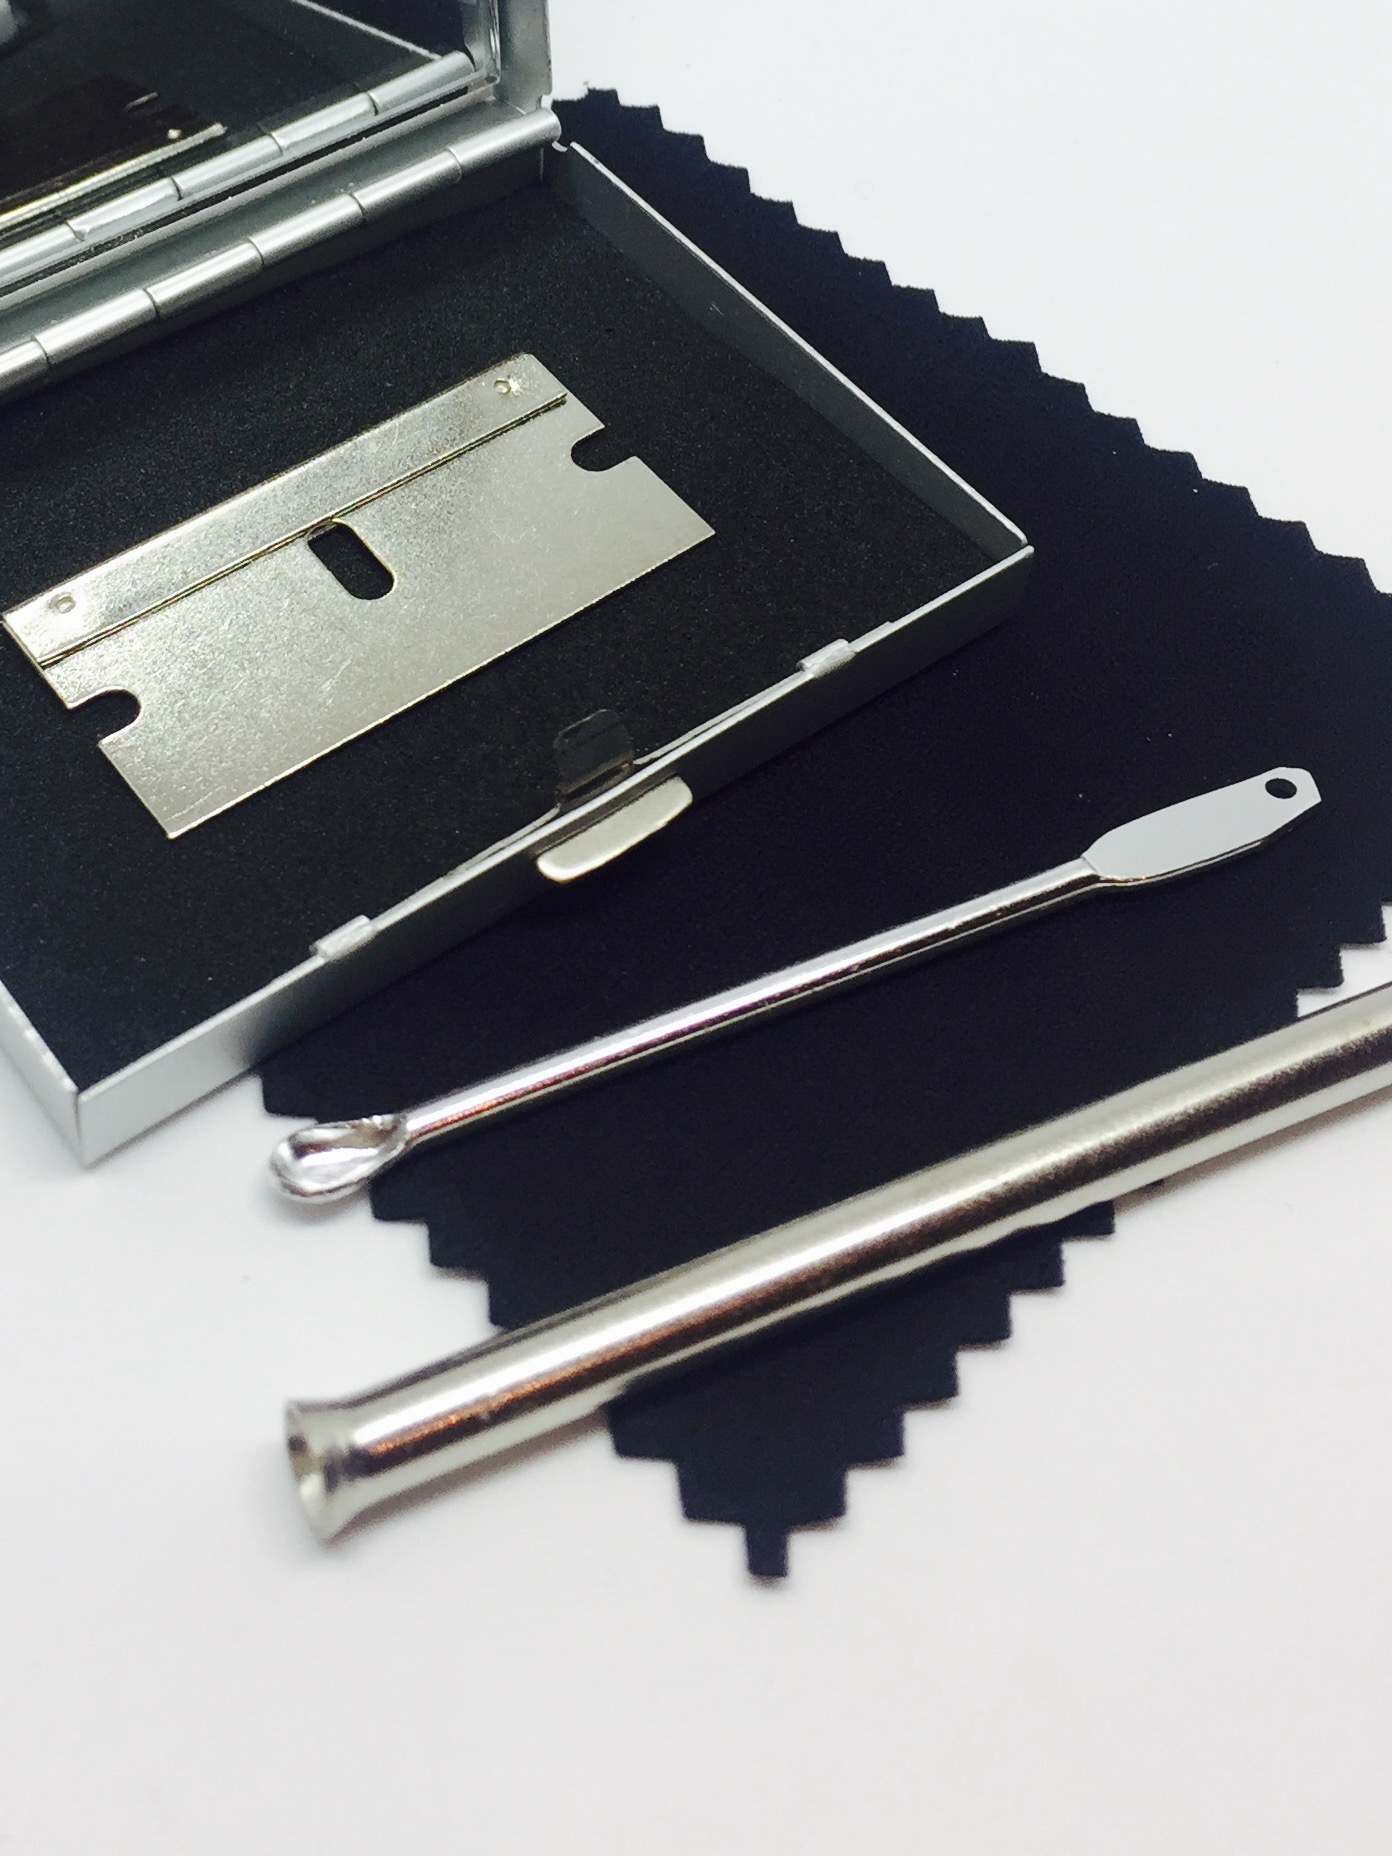 Snuff Snorting Kit - Silver Metal Case